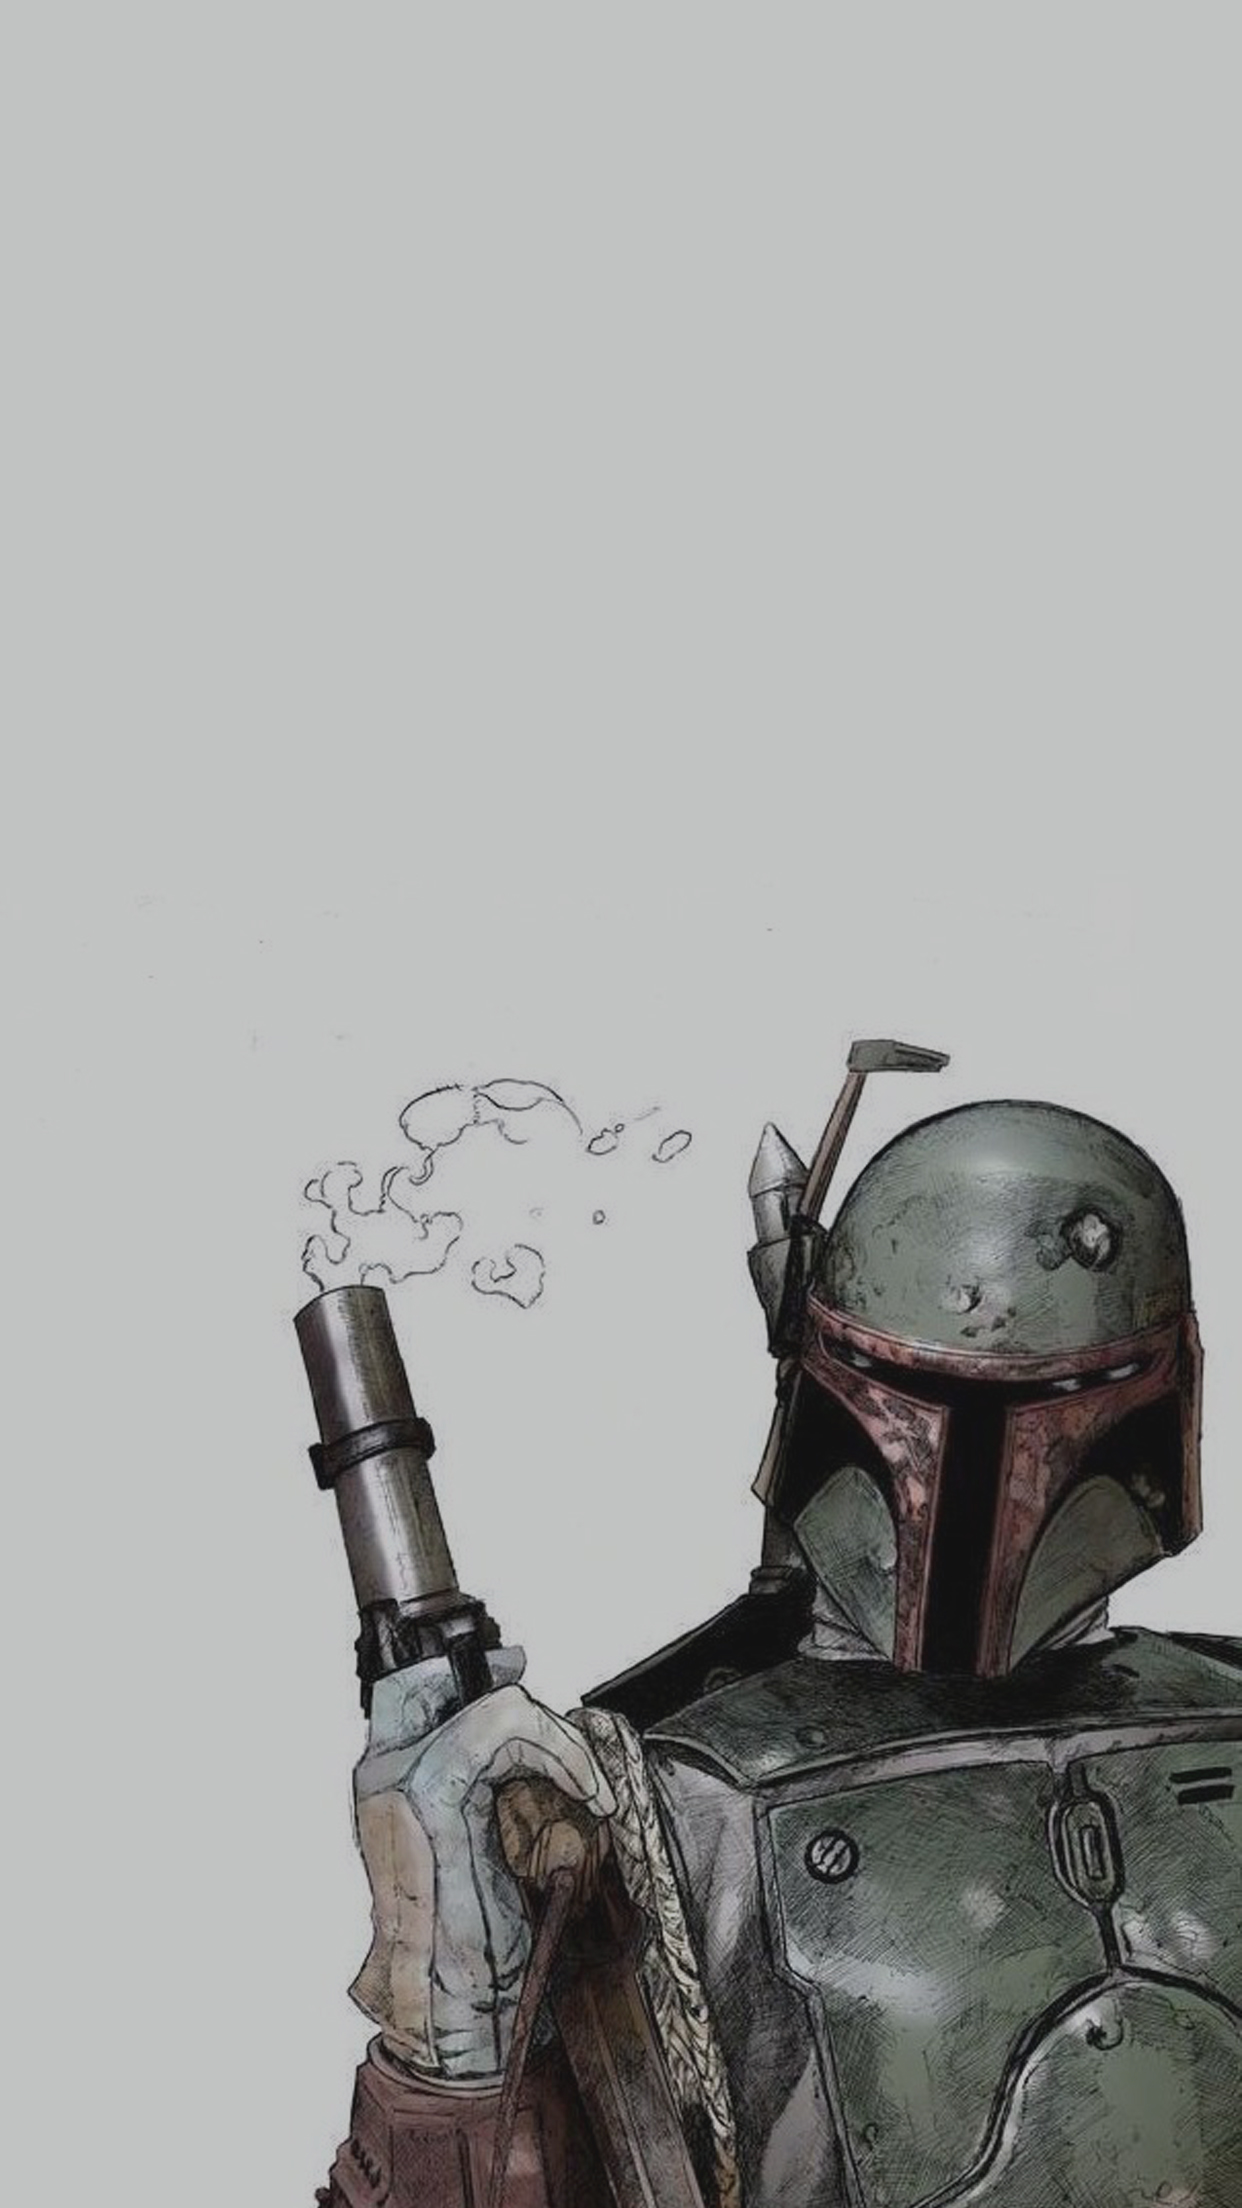 force-awakens-wallpaper (1)